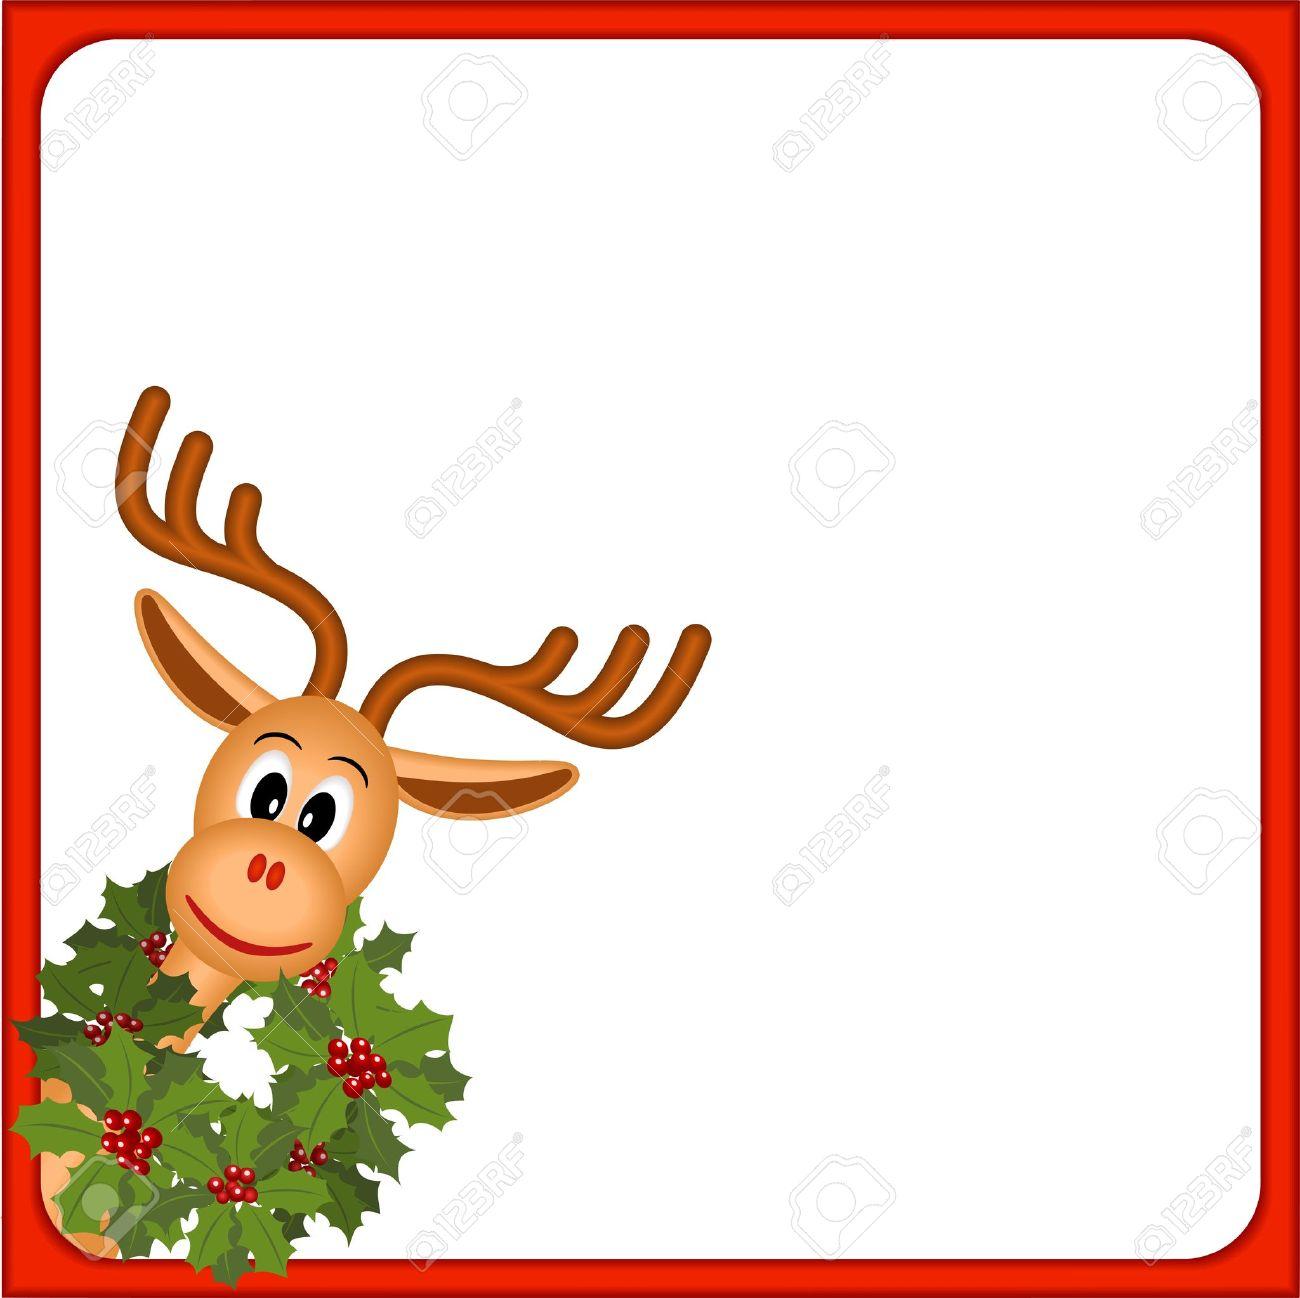 1300x1298 Christmas Borders Clipart